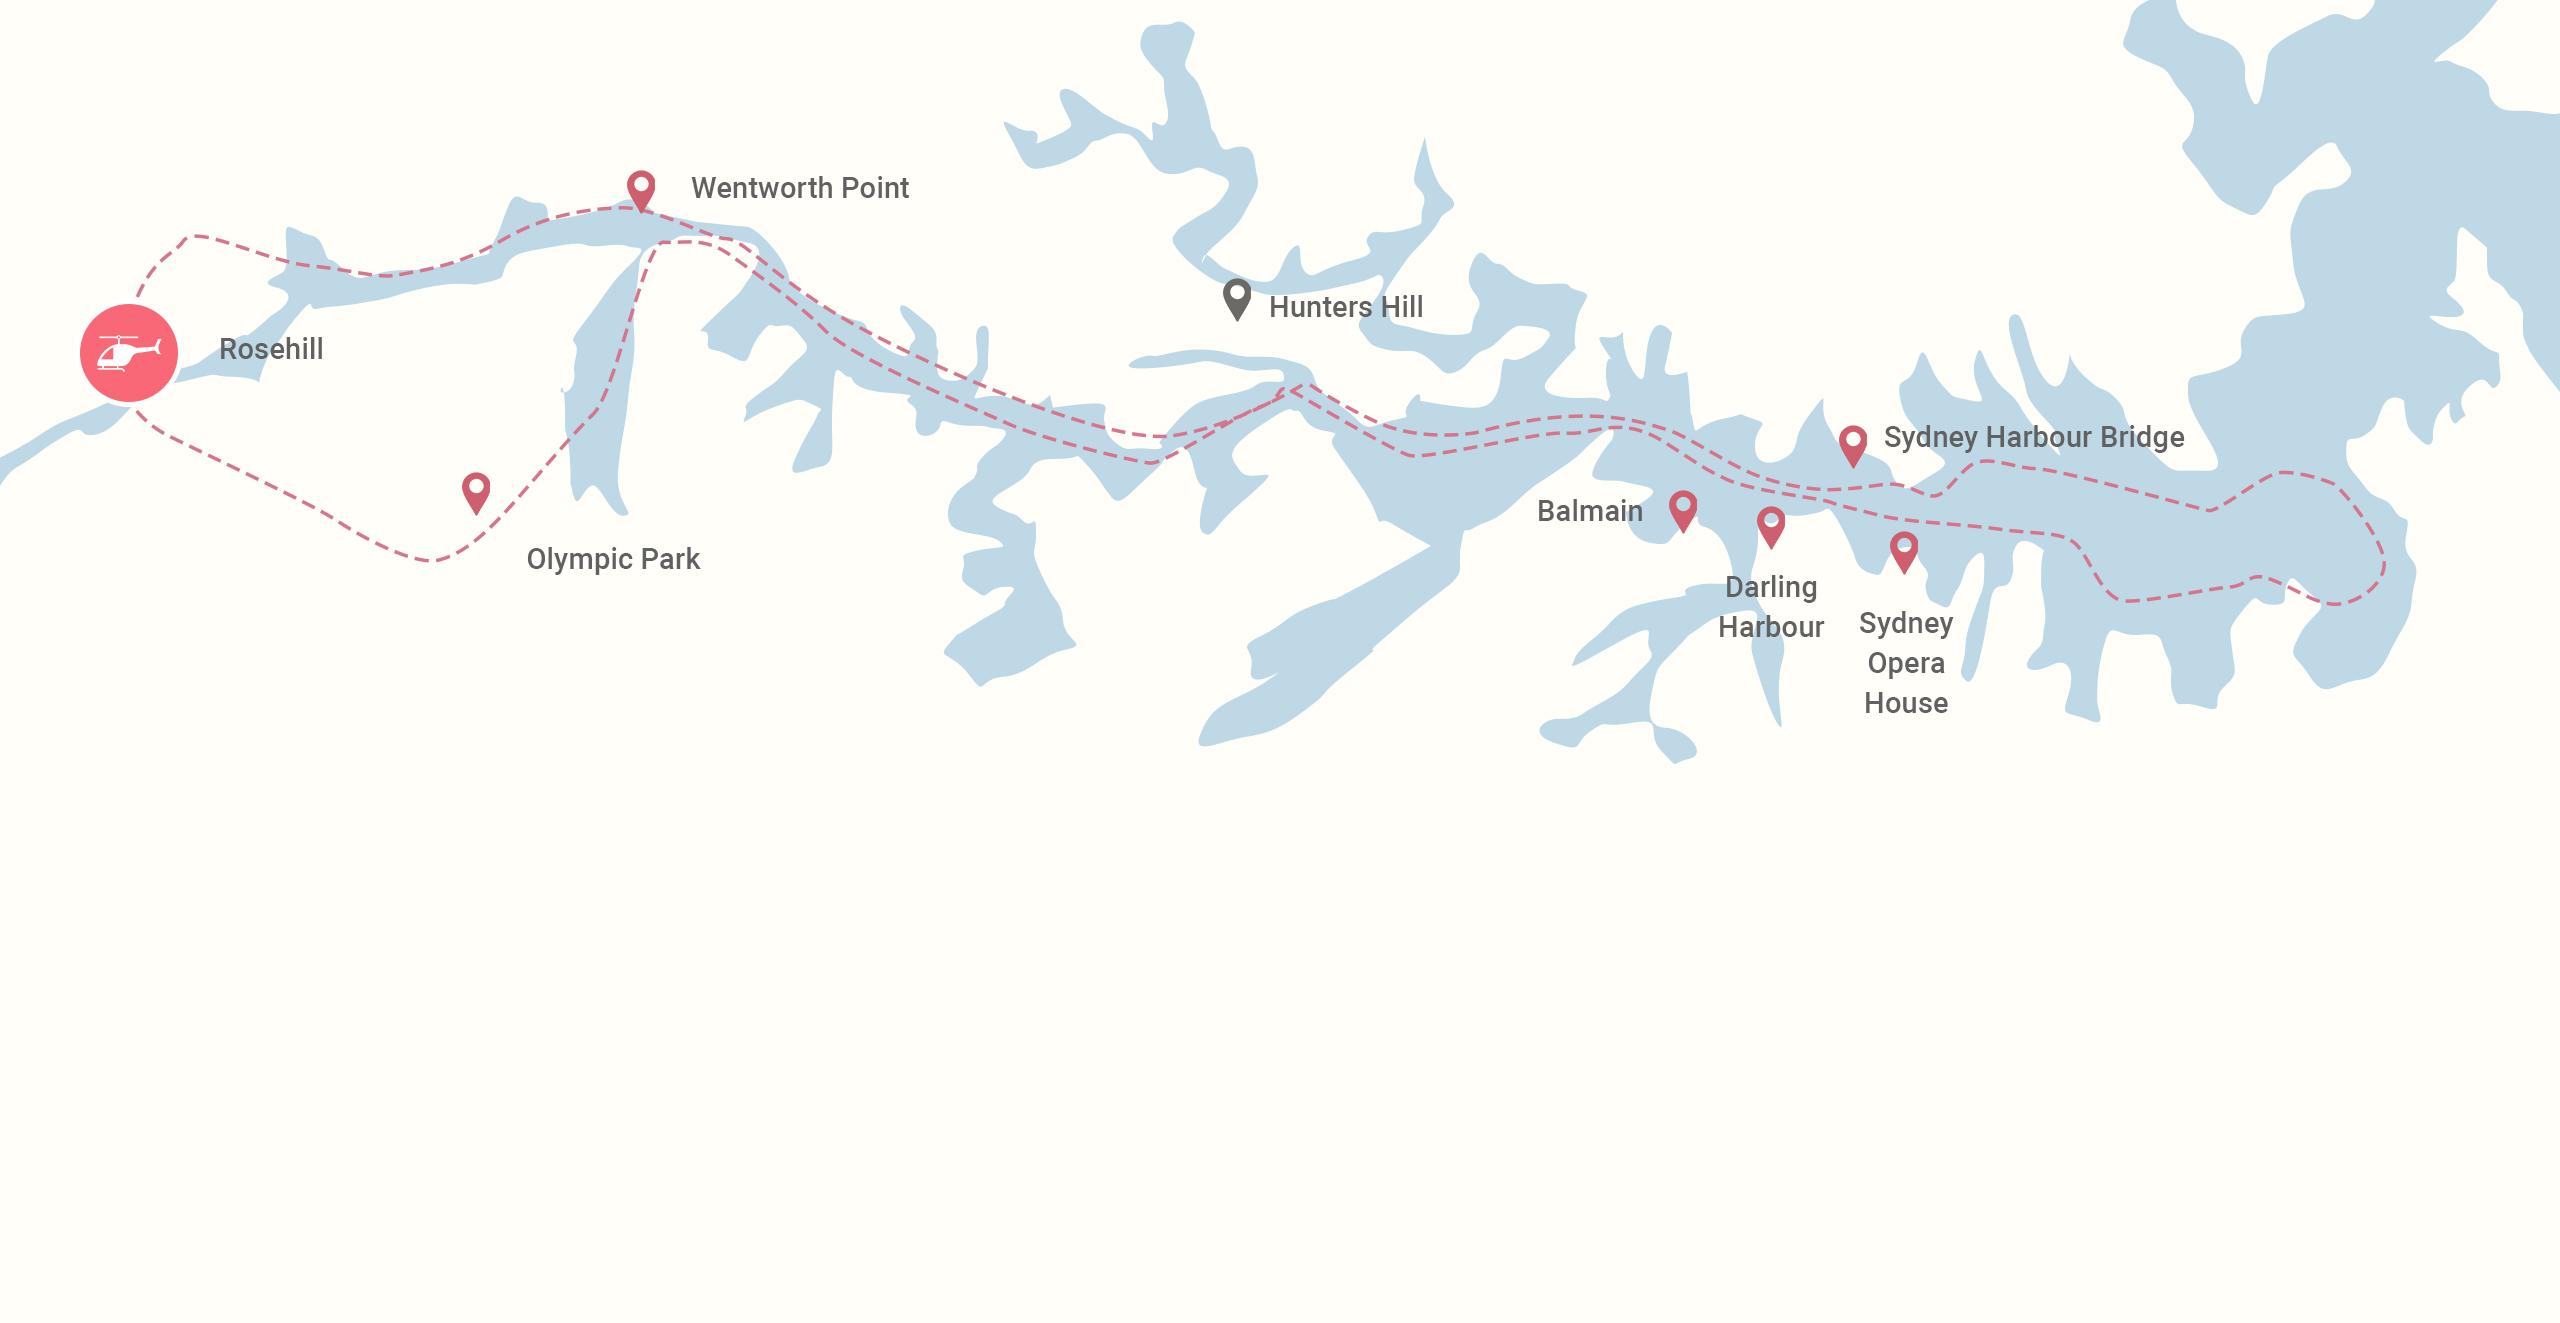 Sydney Icon Flight Map